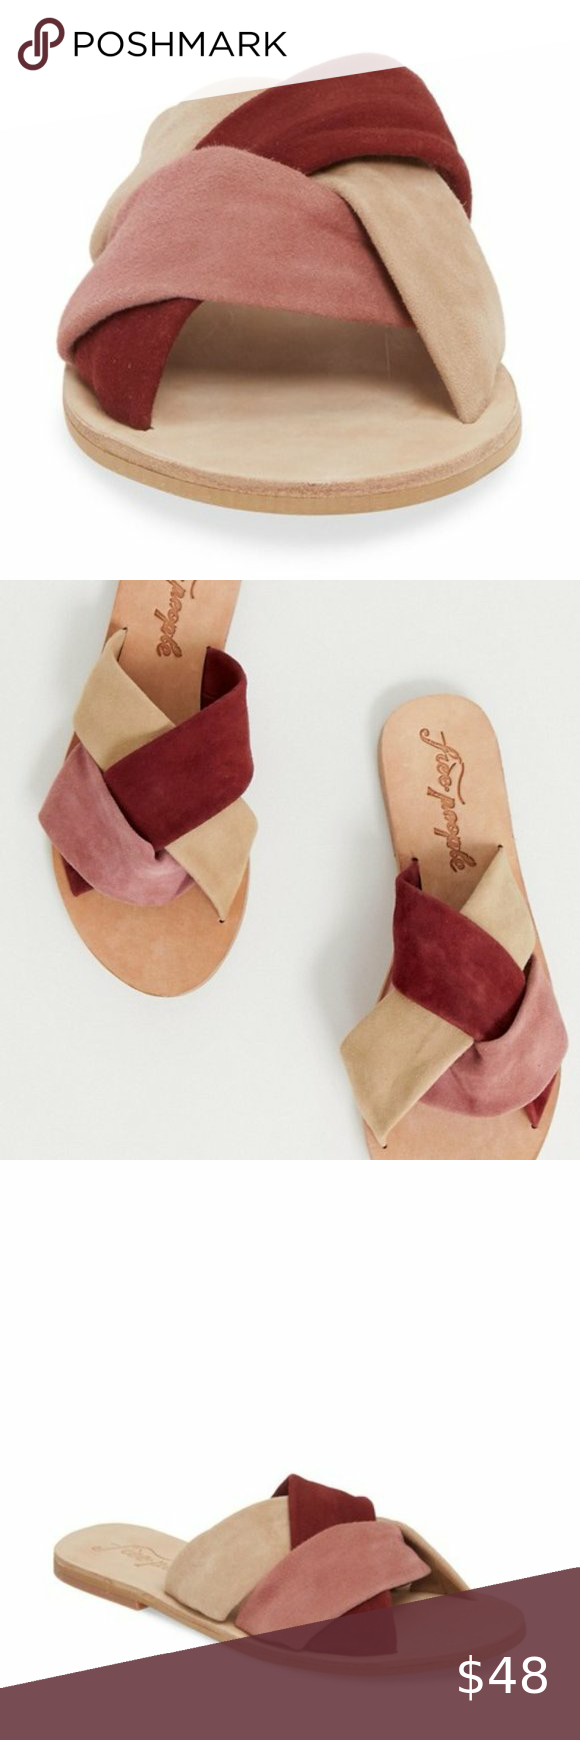 Nib Free People Rios Vista Slide Sandal Braided Leather Sandals Free People Gladiator Sandals Tie Up Sandals